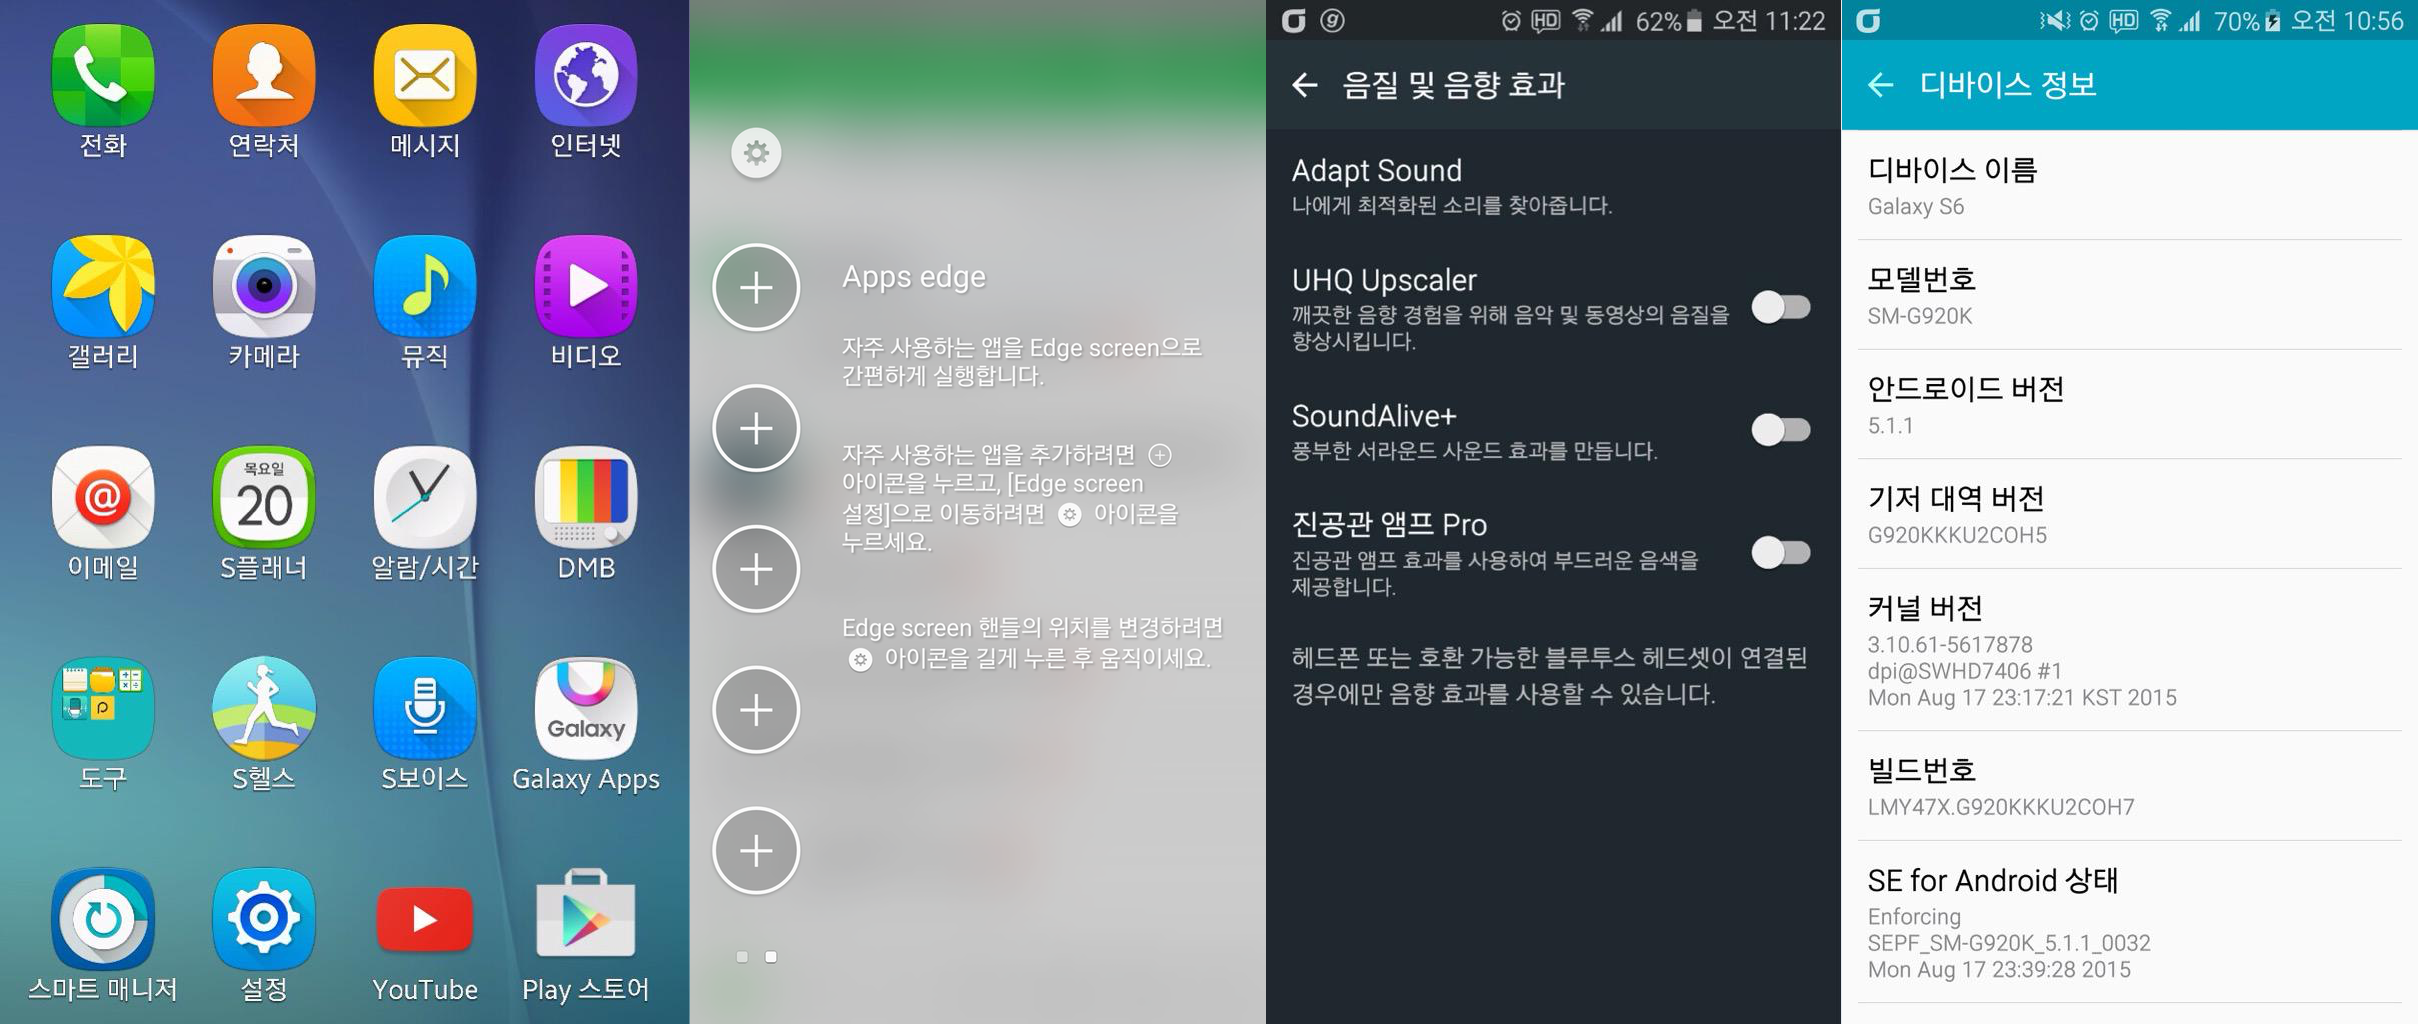 Samsung Galaxy S6 Edge Features Update